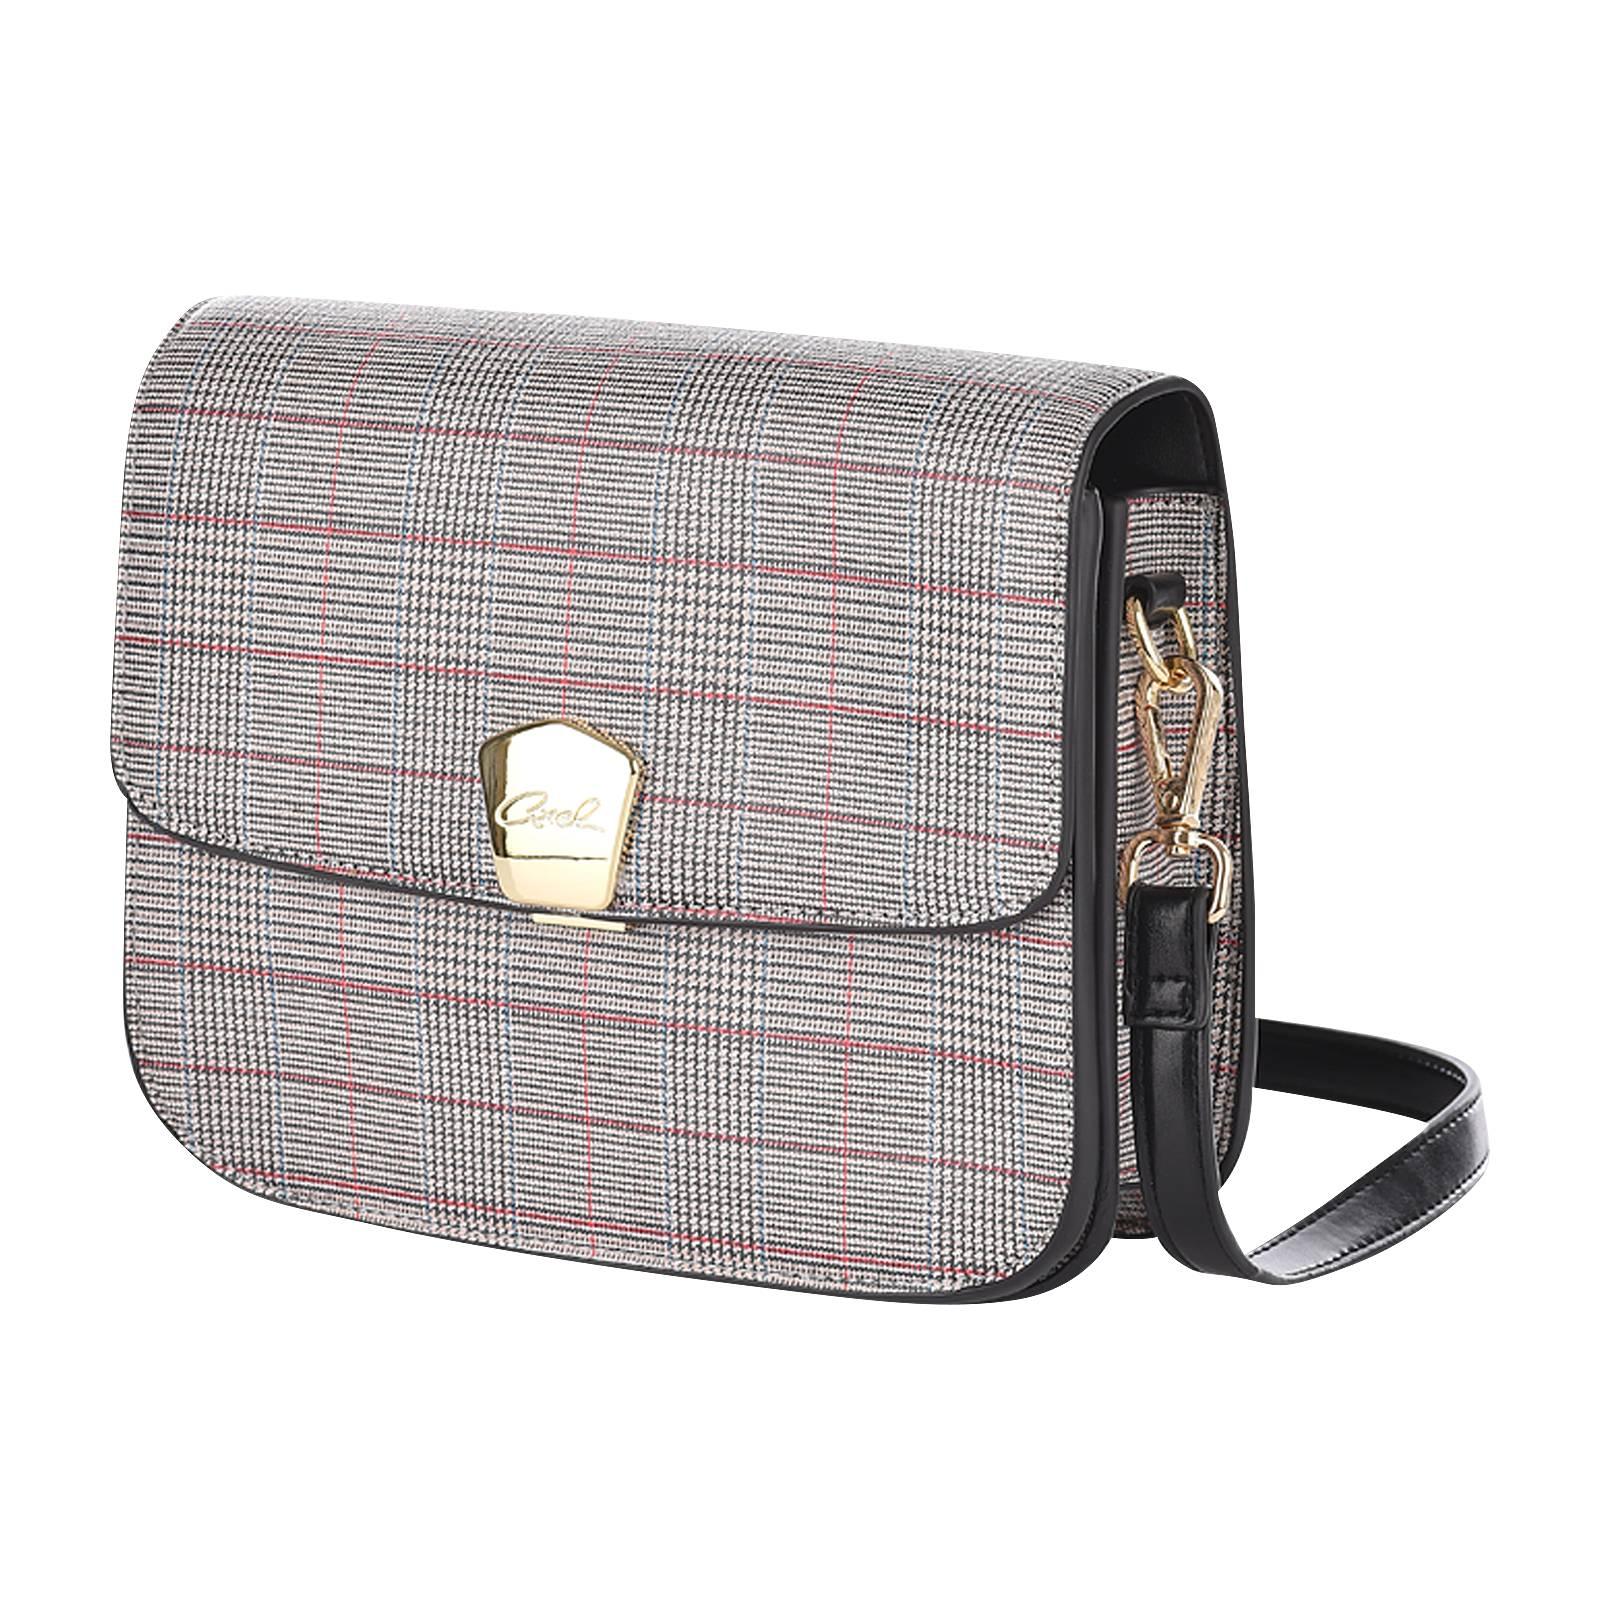 Prince de Galles - Γυναικεία τσάντα Axel από δερμα συνθετικο ... 15afa99ca74